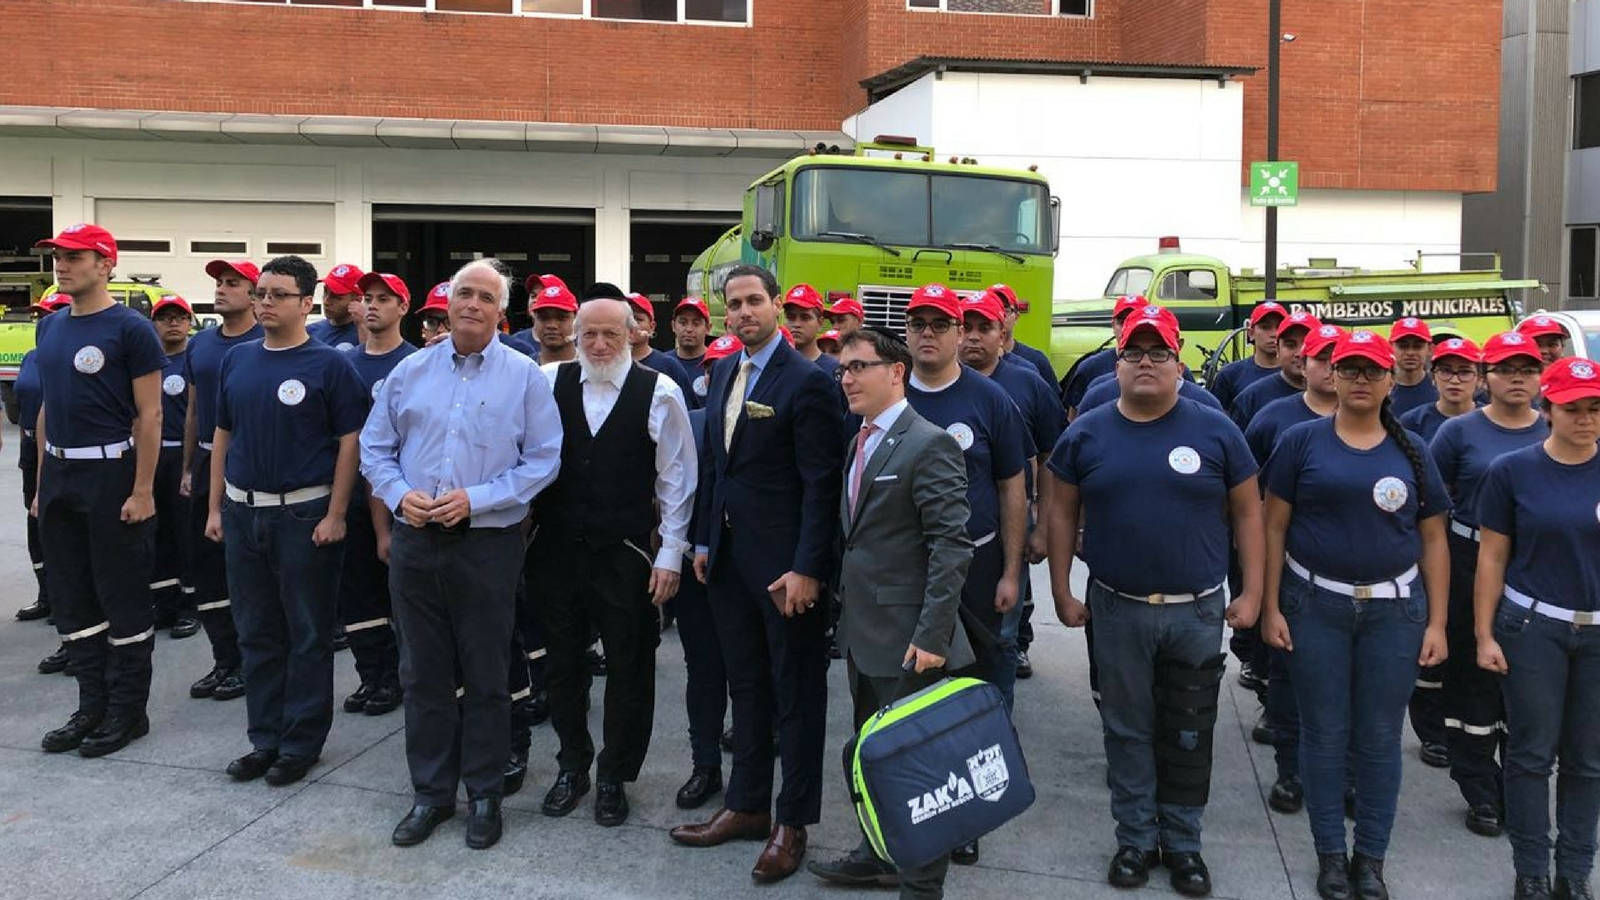 ZAKA met with the fire service in Guatemala. Photo courtesy of ZAKA